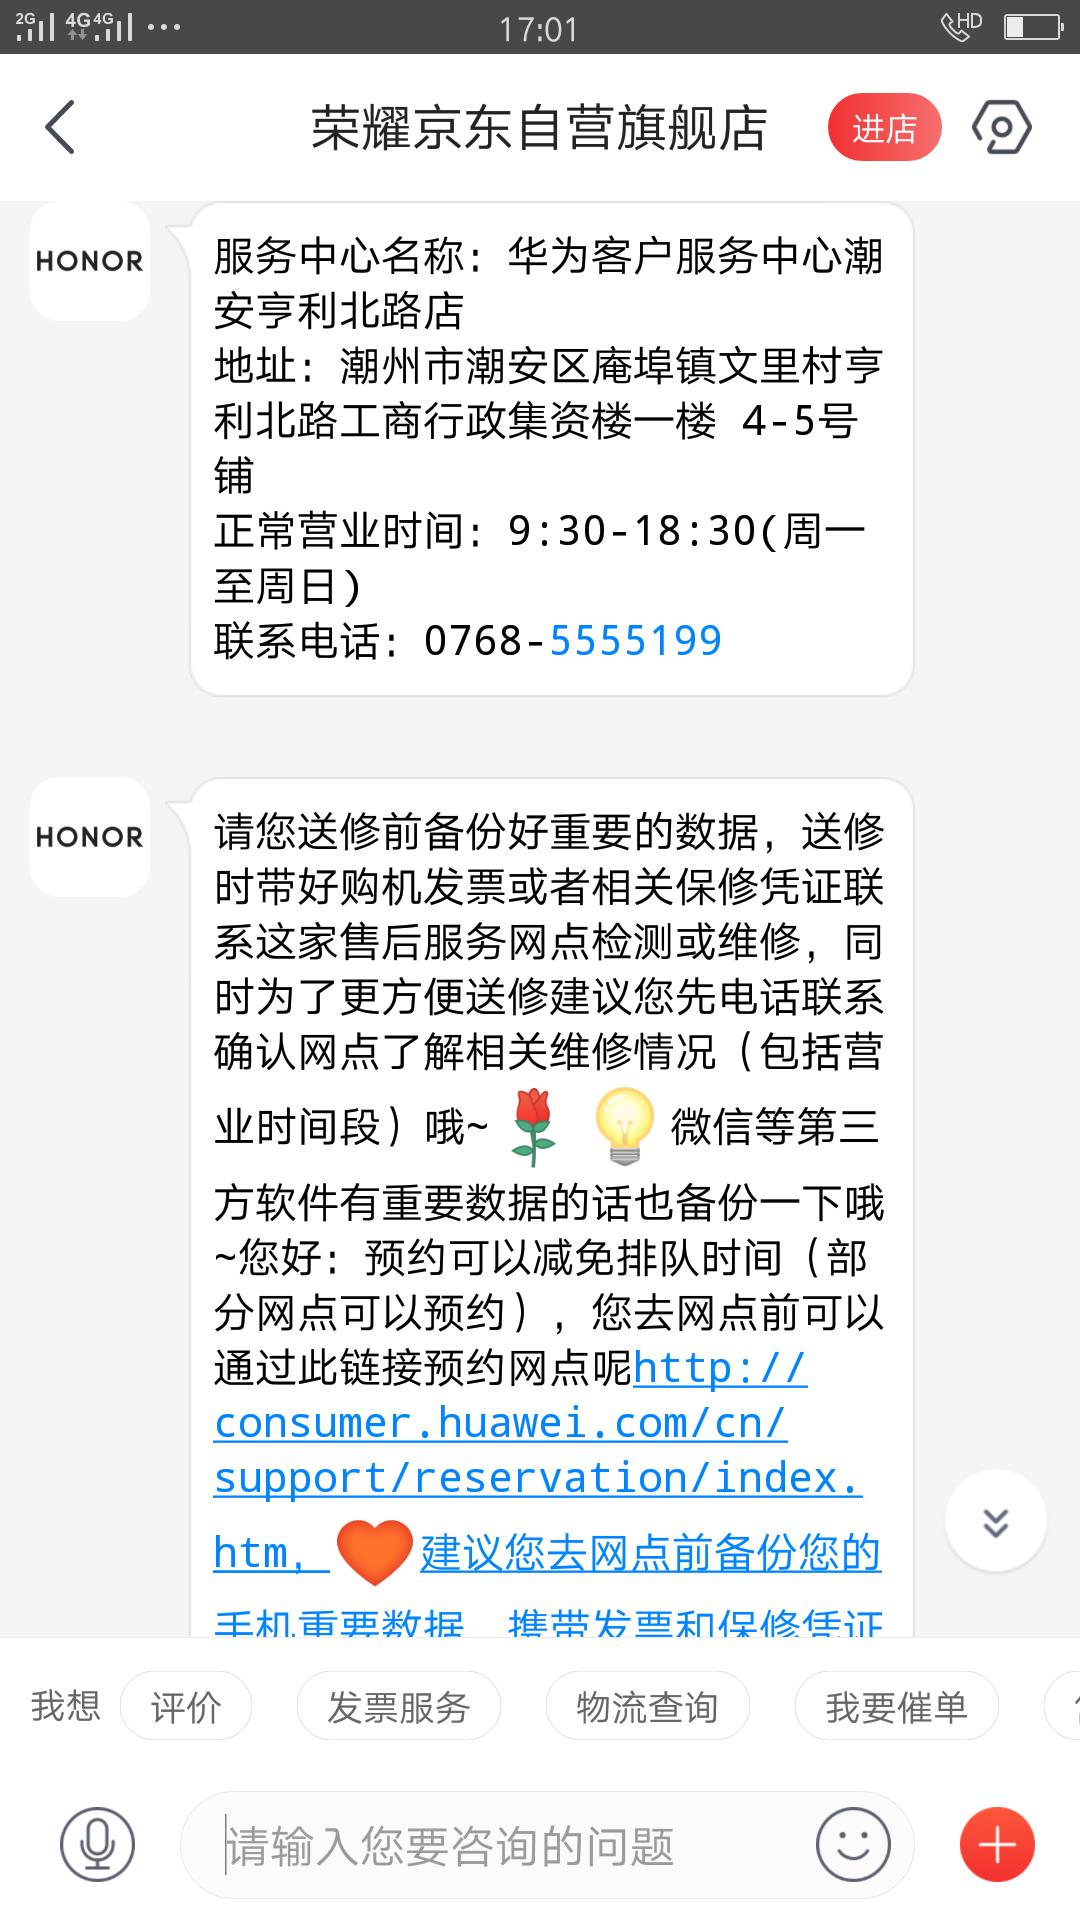 Screenshot_2019-08-24-17-01-19-10.png